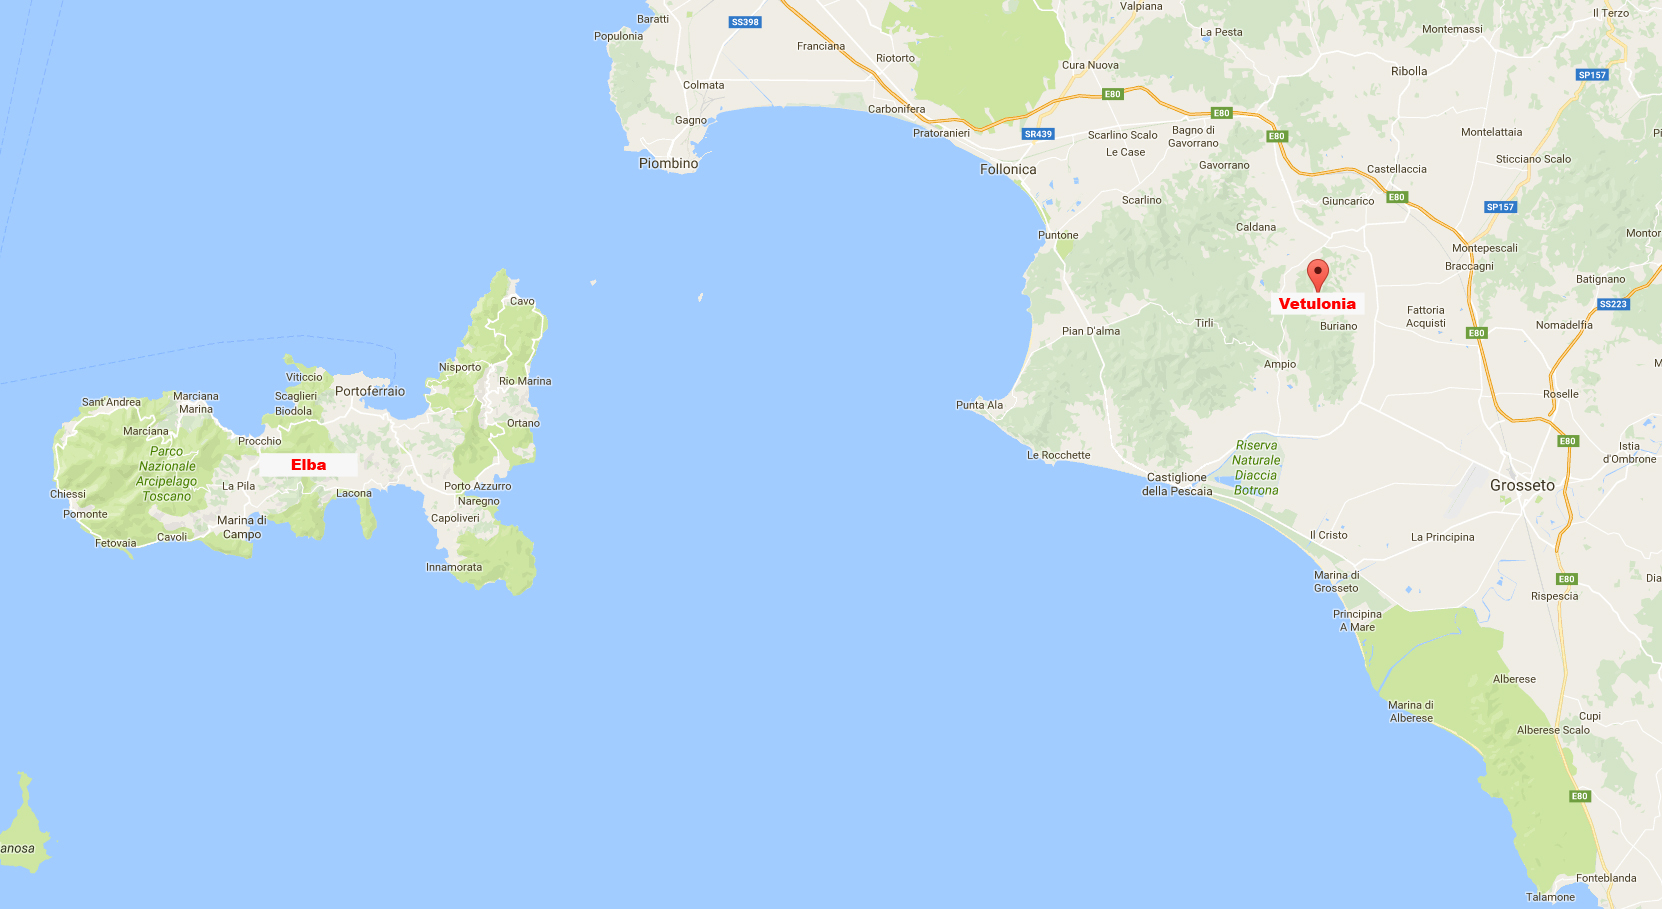 Kartendaten (c) 2016 Google